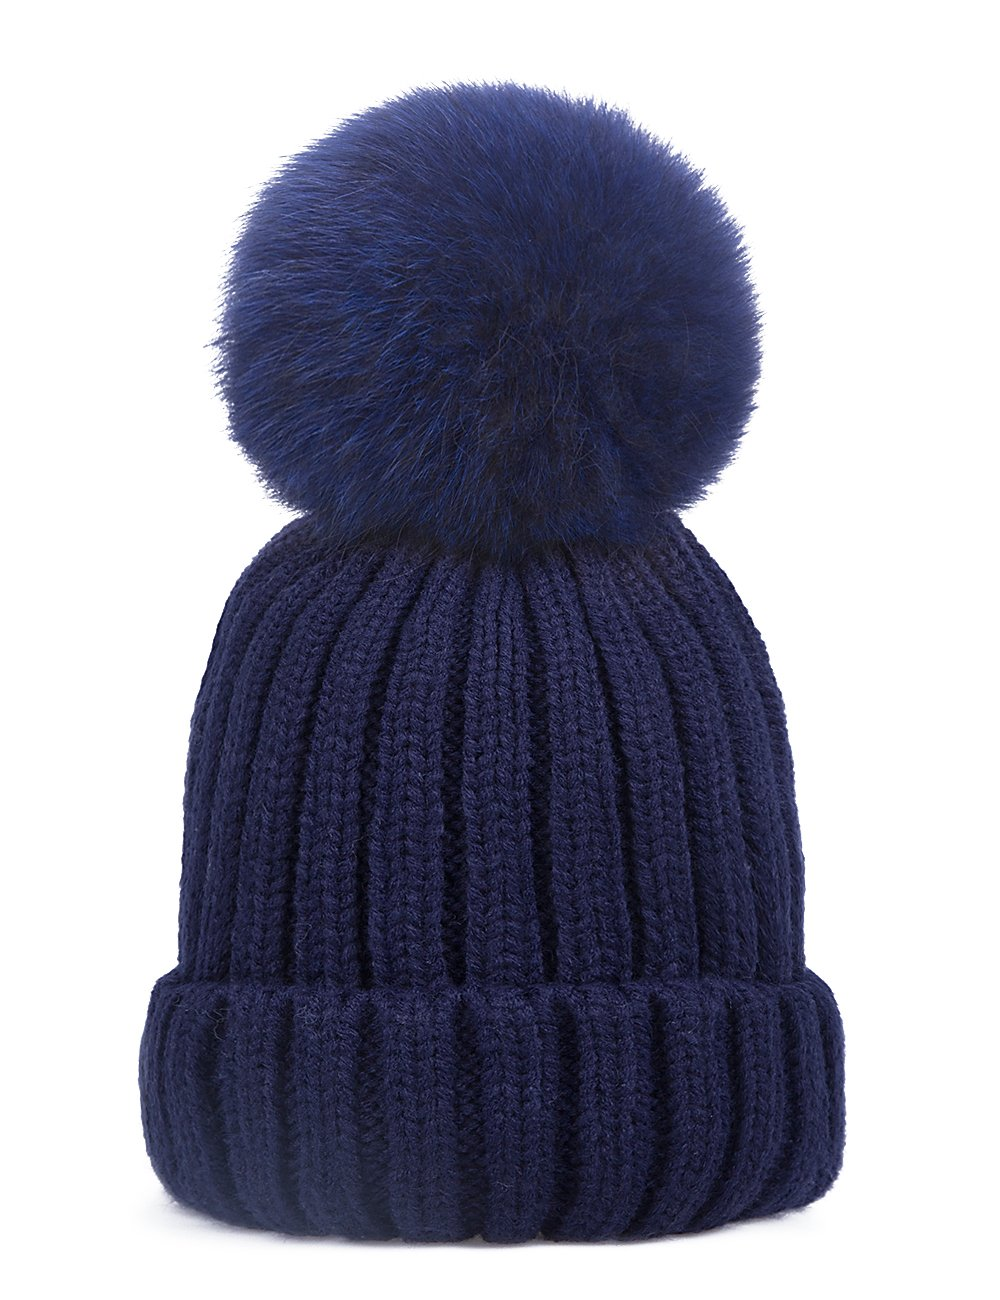 EVRFELAN Winter Hand Faux Fur Hat Pompoms Beanie Cable Knit Warm Family Crochet Ski Skull Cap for Girls (fox dark blue)